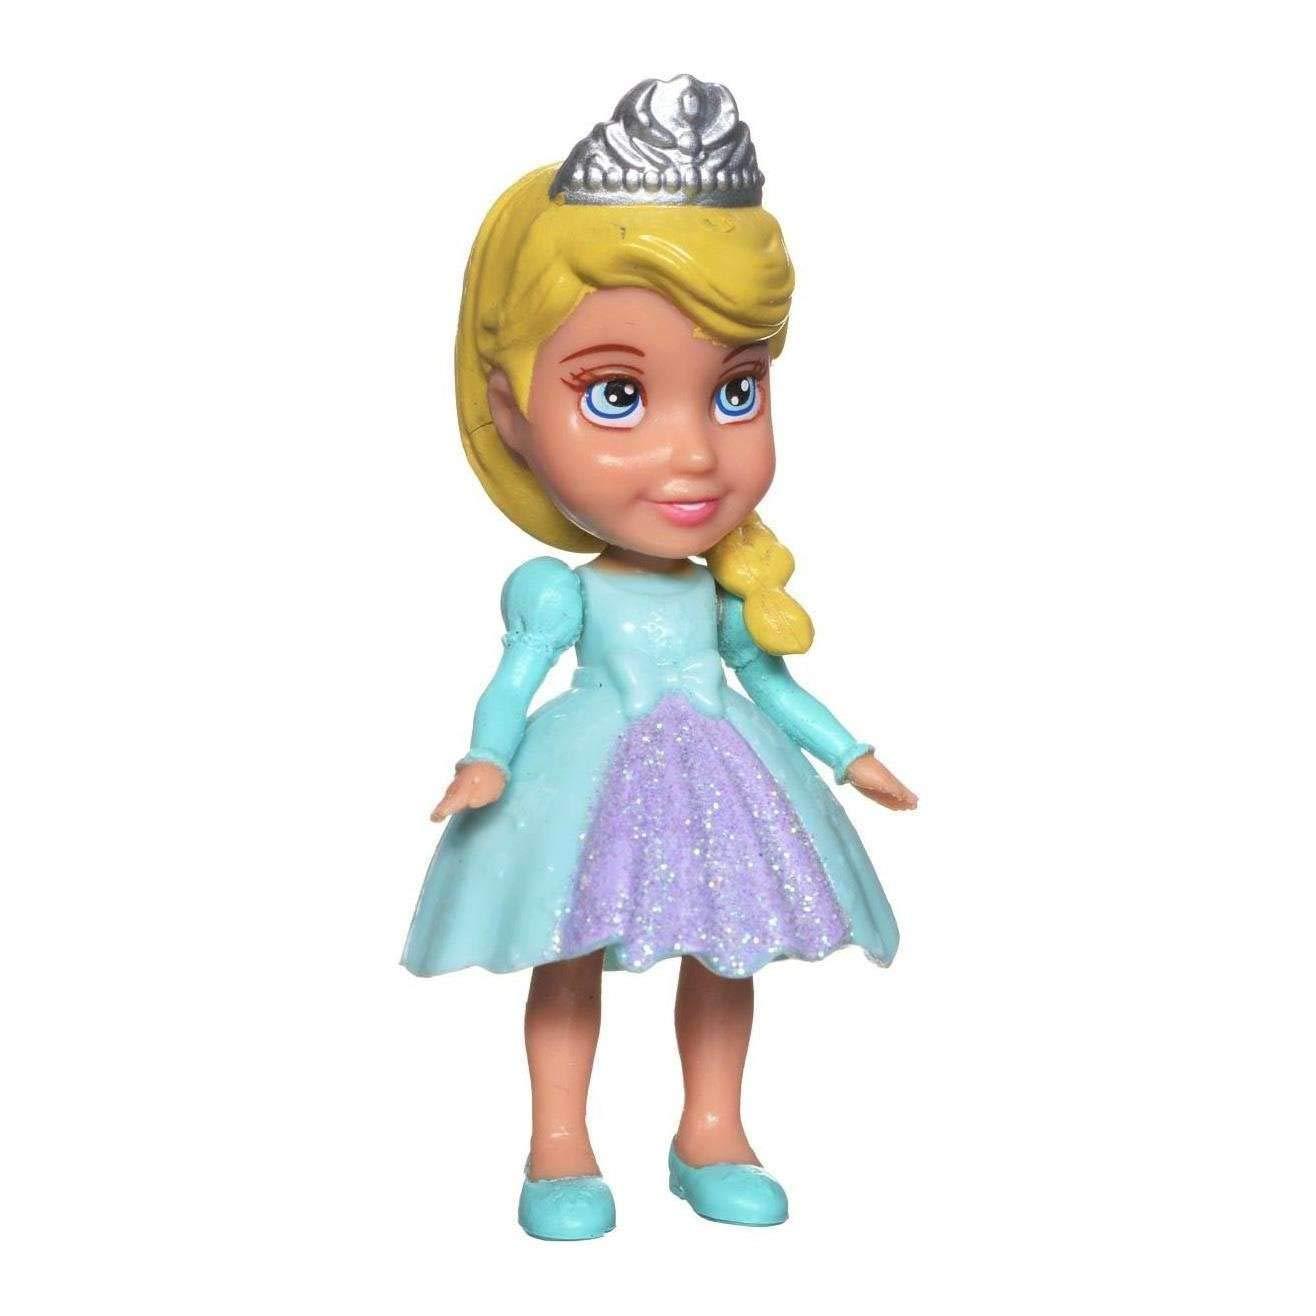 "Disney Frozen Toddler Elsa 3"" Mini Doll"